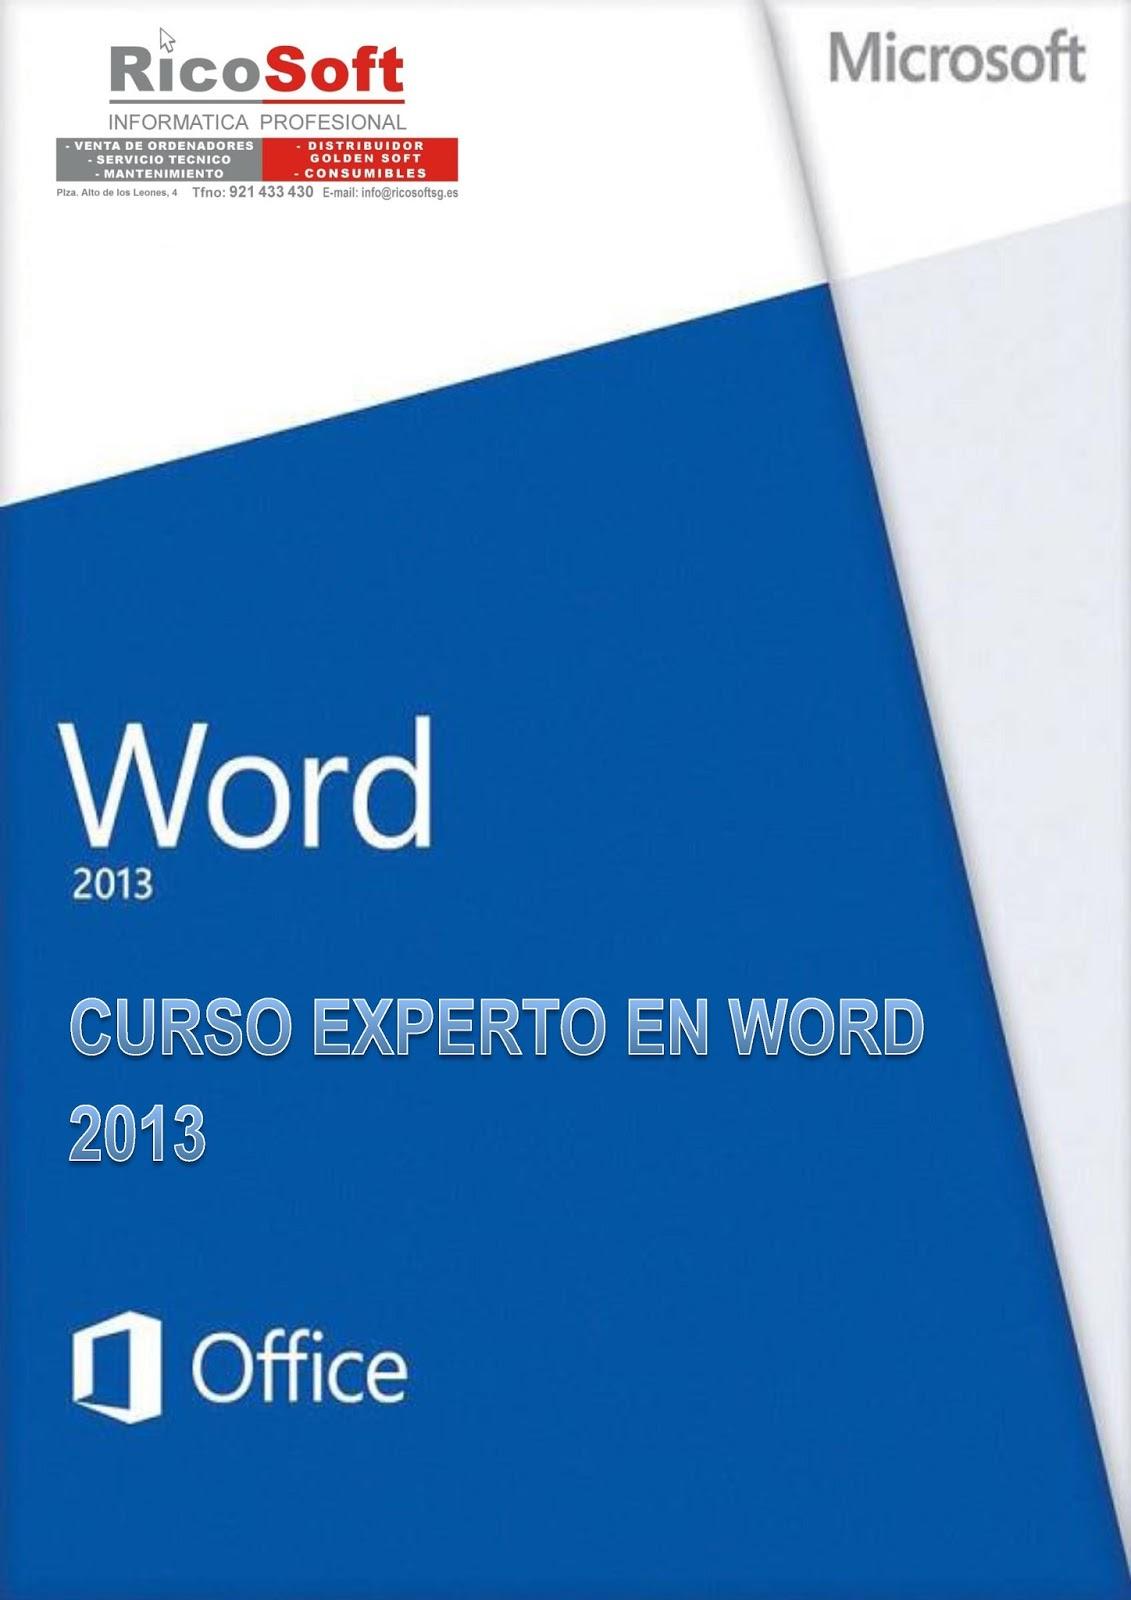 Curso Experto en Microsoft Word 2013 – Aulaclic